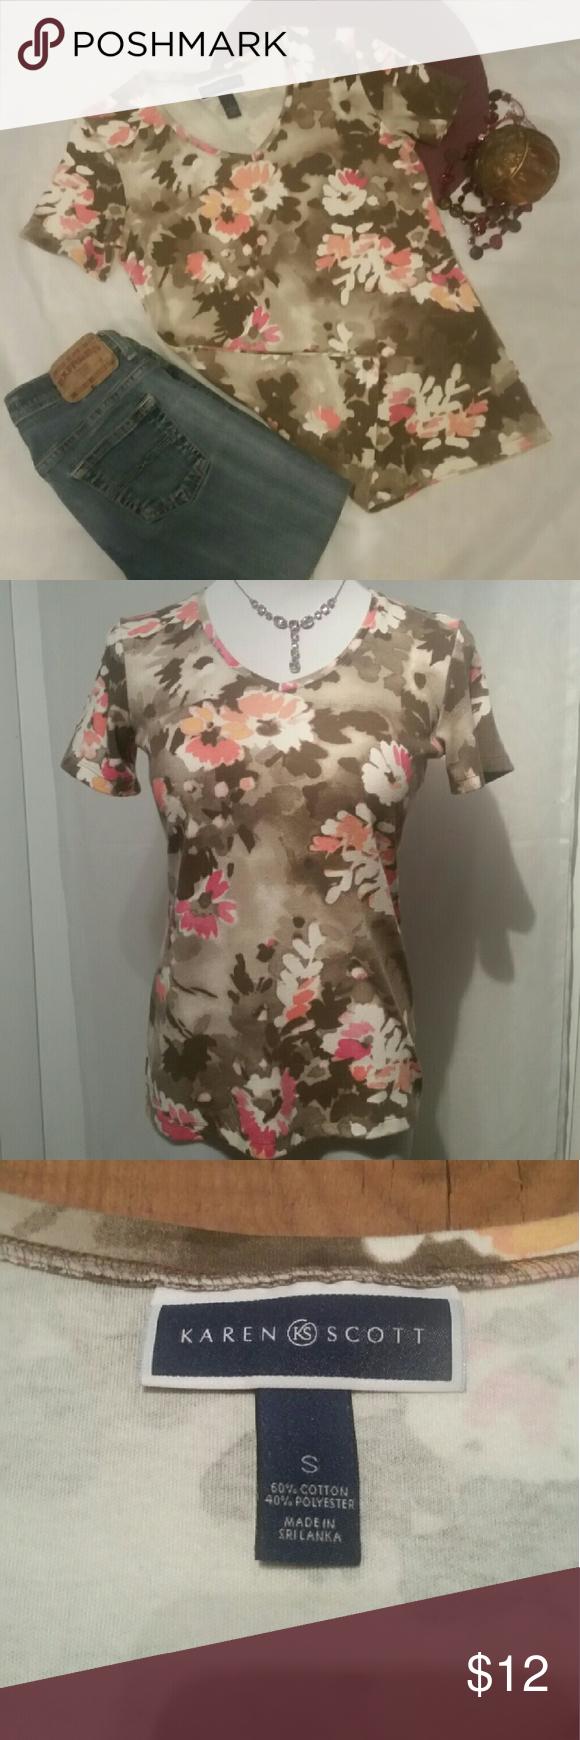 Karen Scott Floral Karen Scott floral cotton/polyester short sleeve V neck top. EUC Great for casual wear,  sturdy material. Karen Scott Tops Blouses